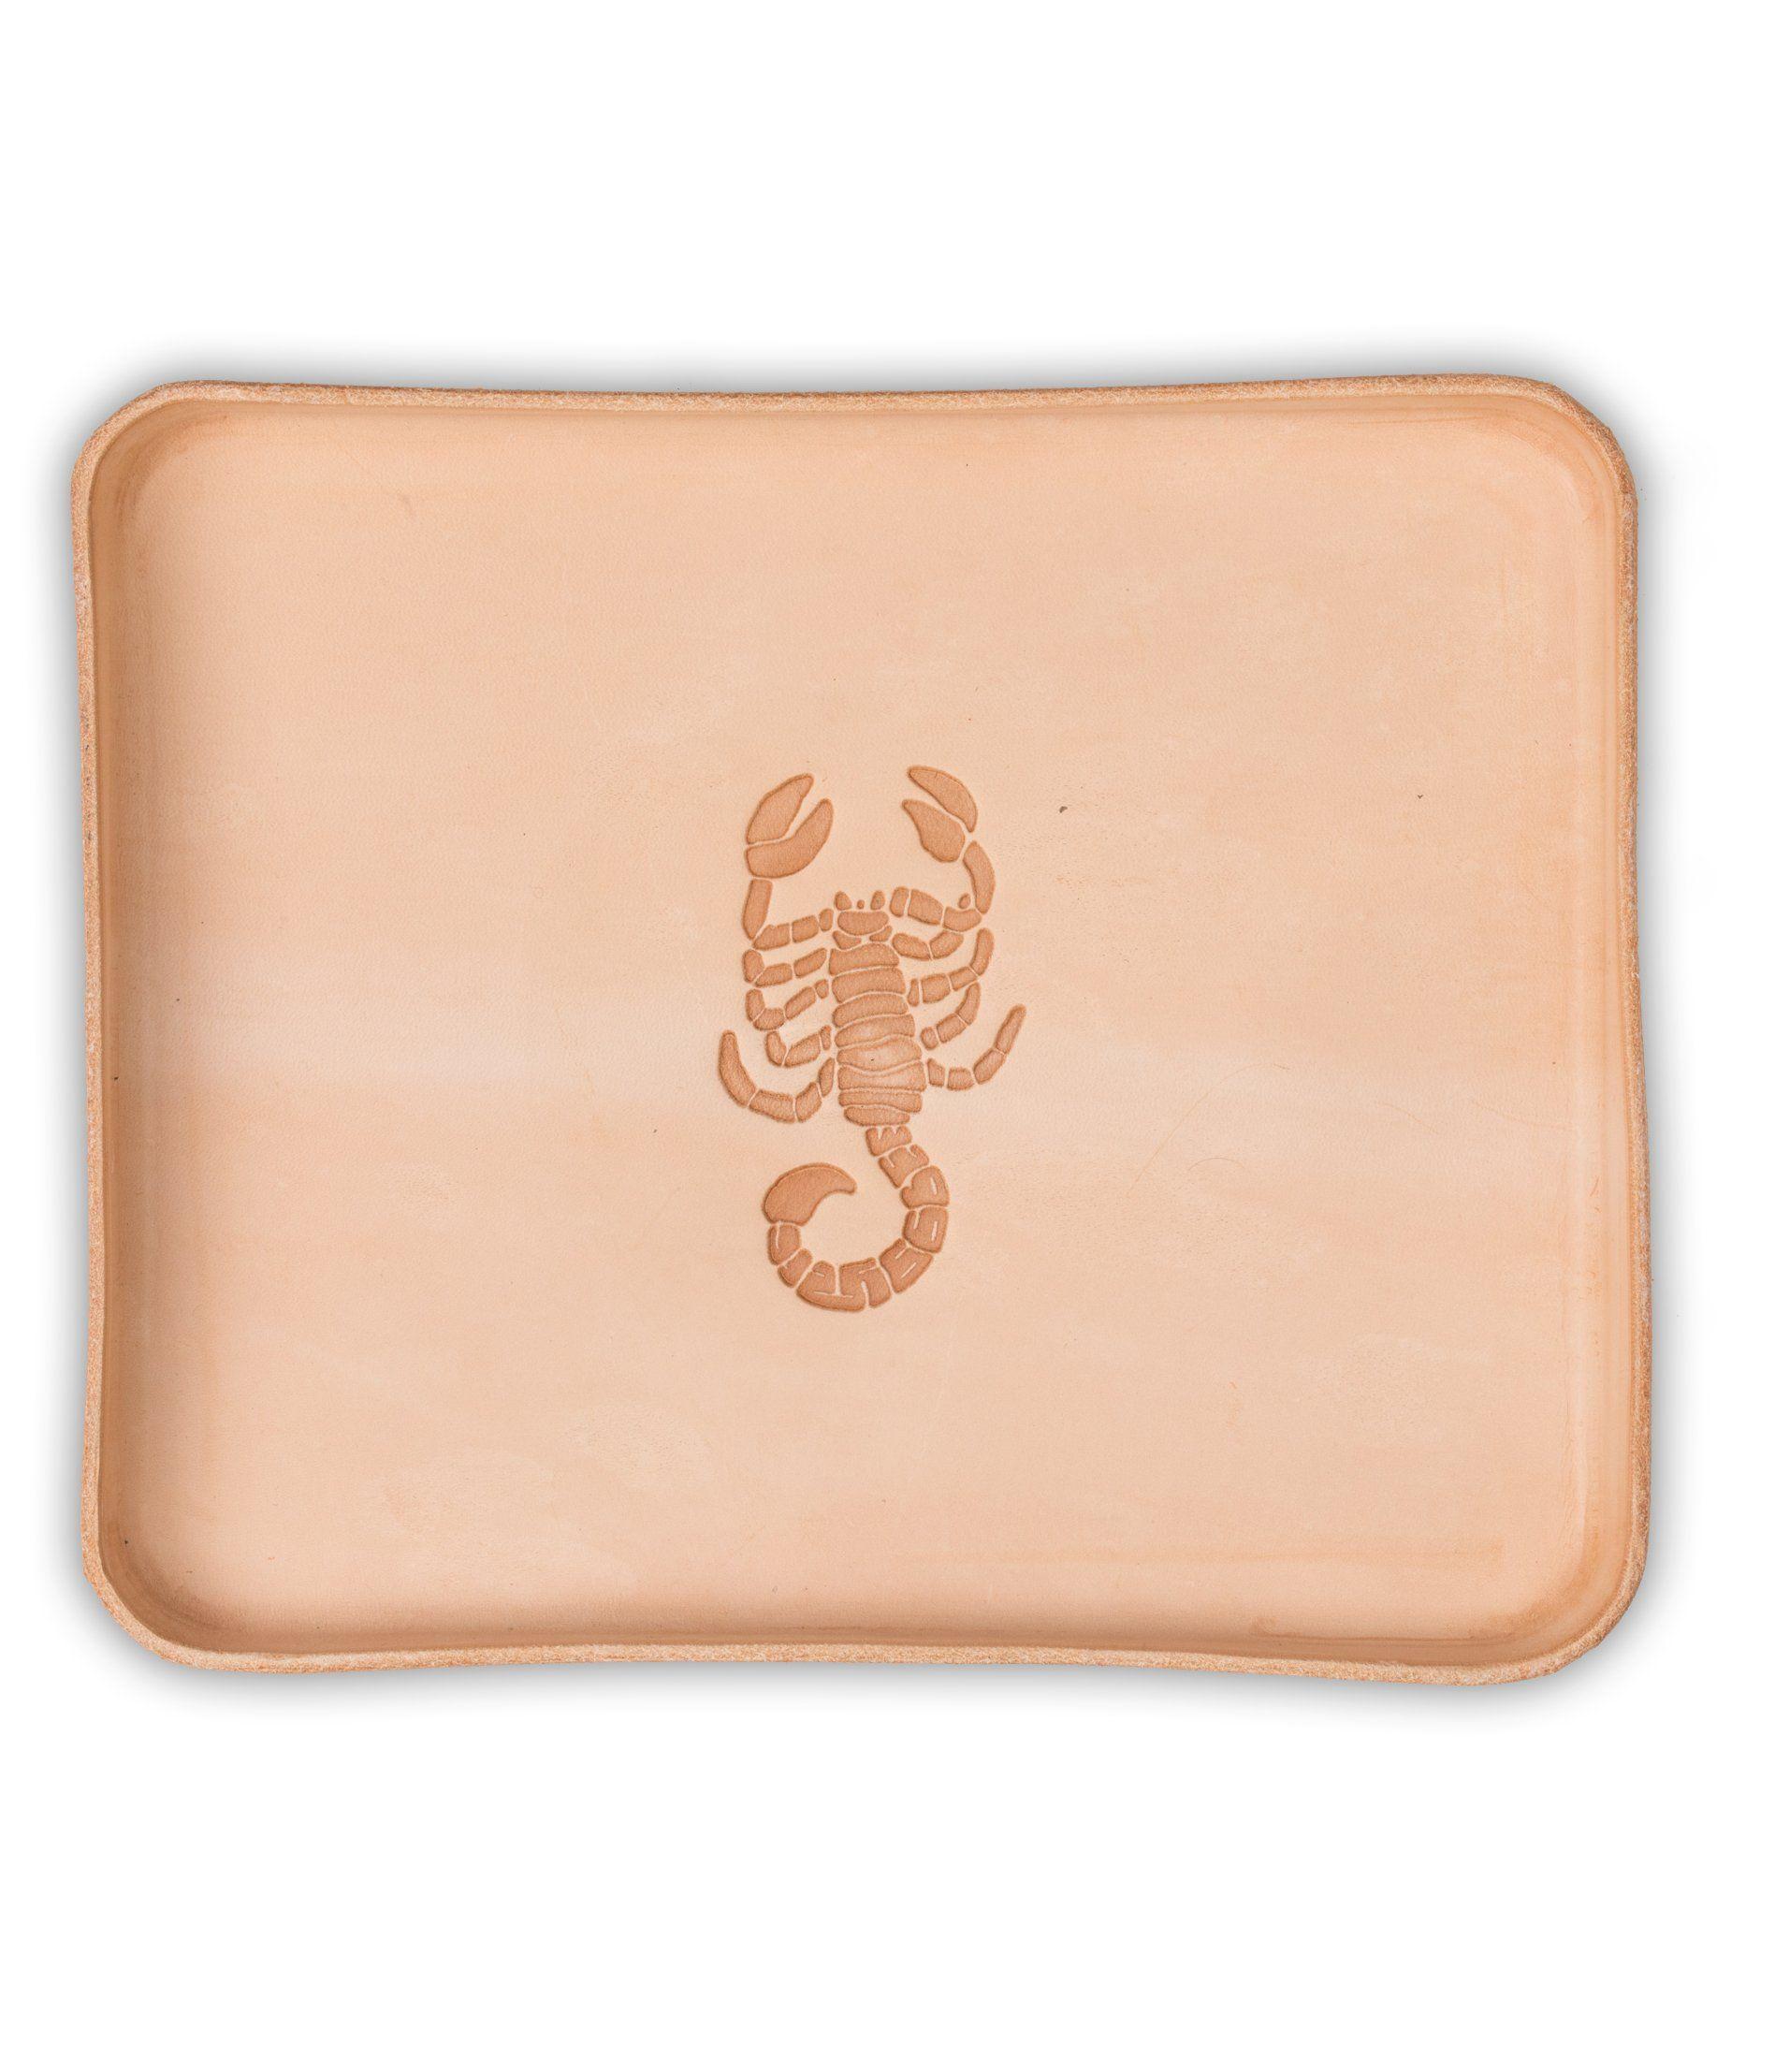 Scorpion Valet Tray - Scorpion